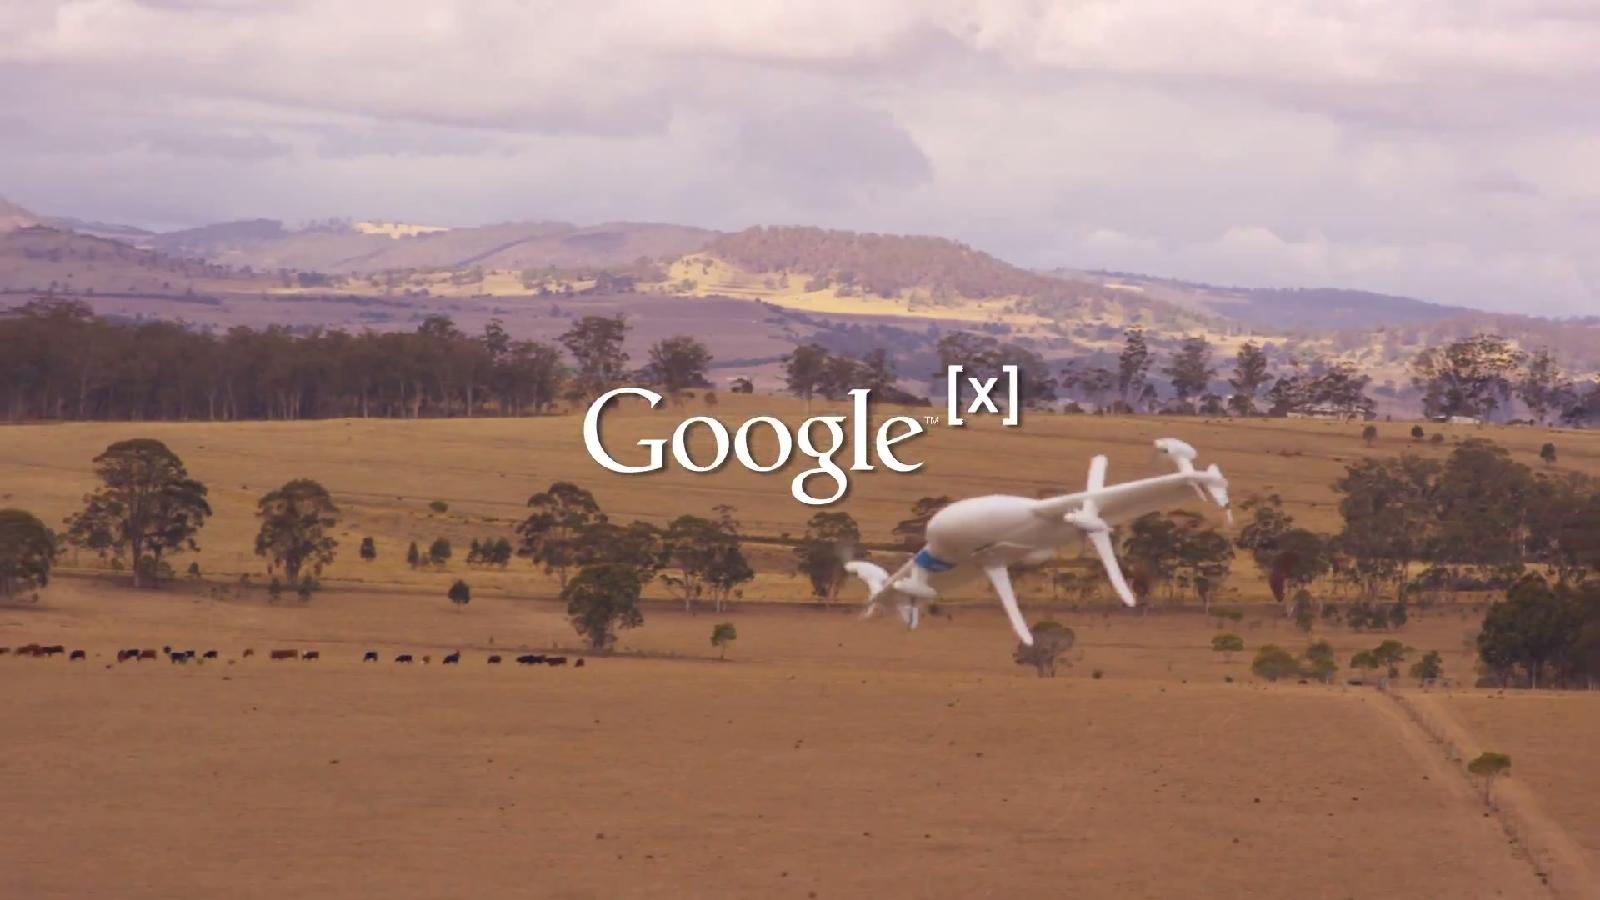 Google Project Wing Google[x]